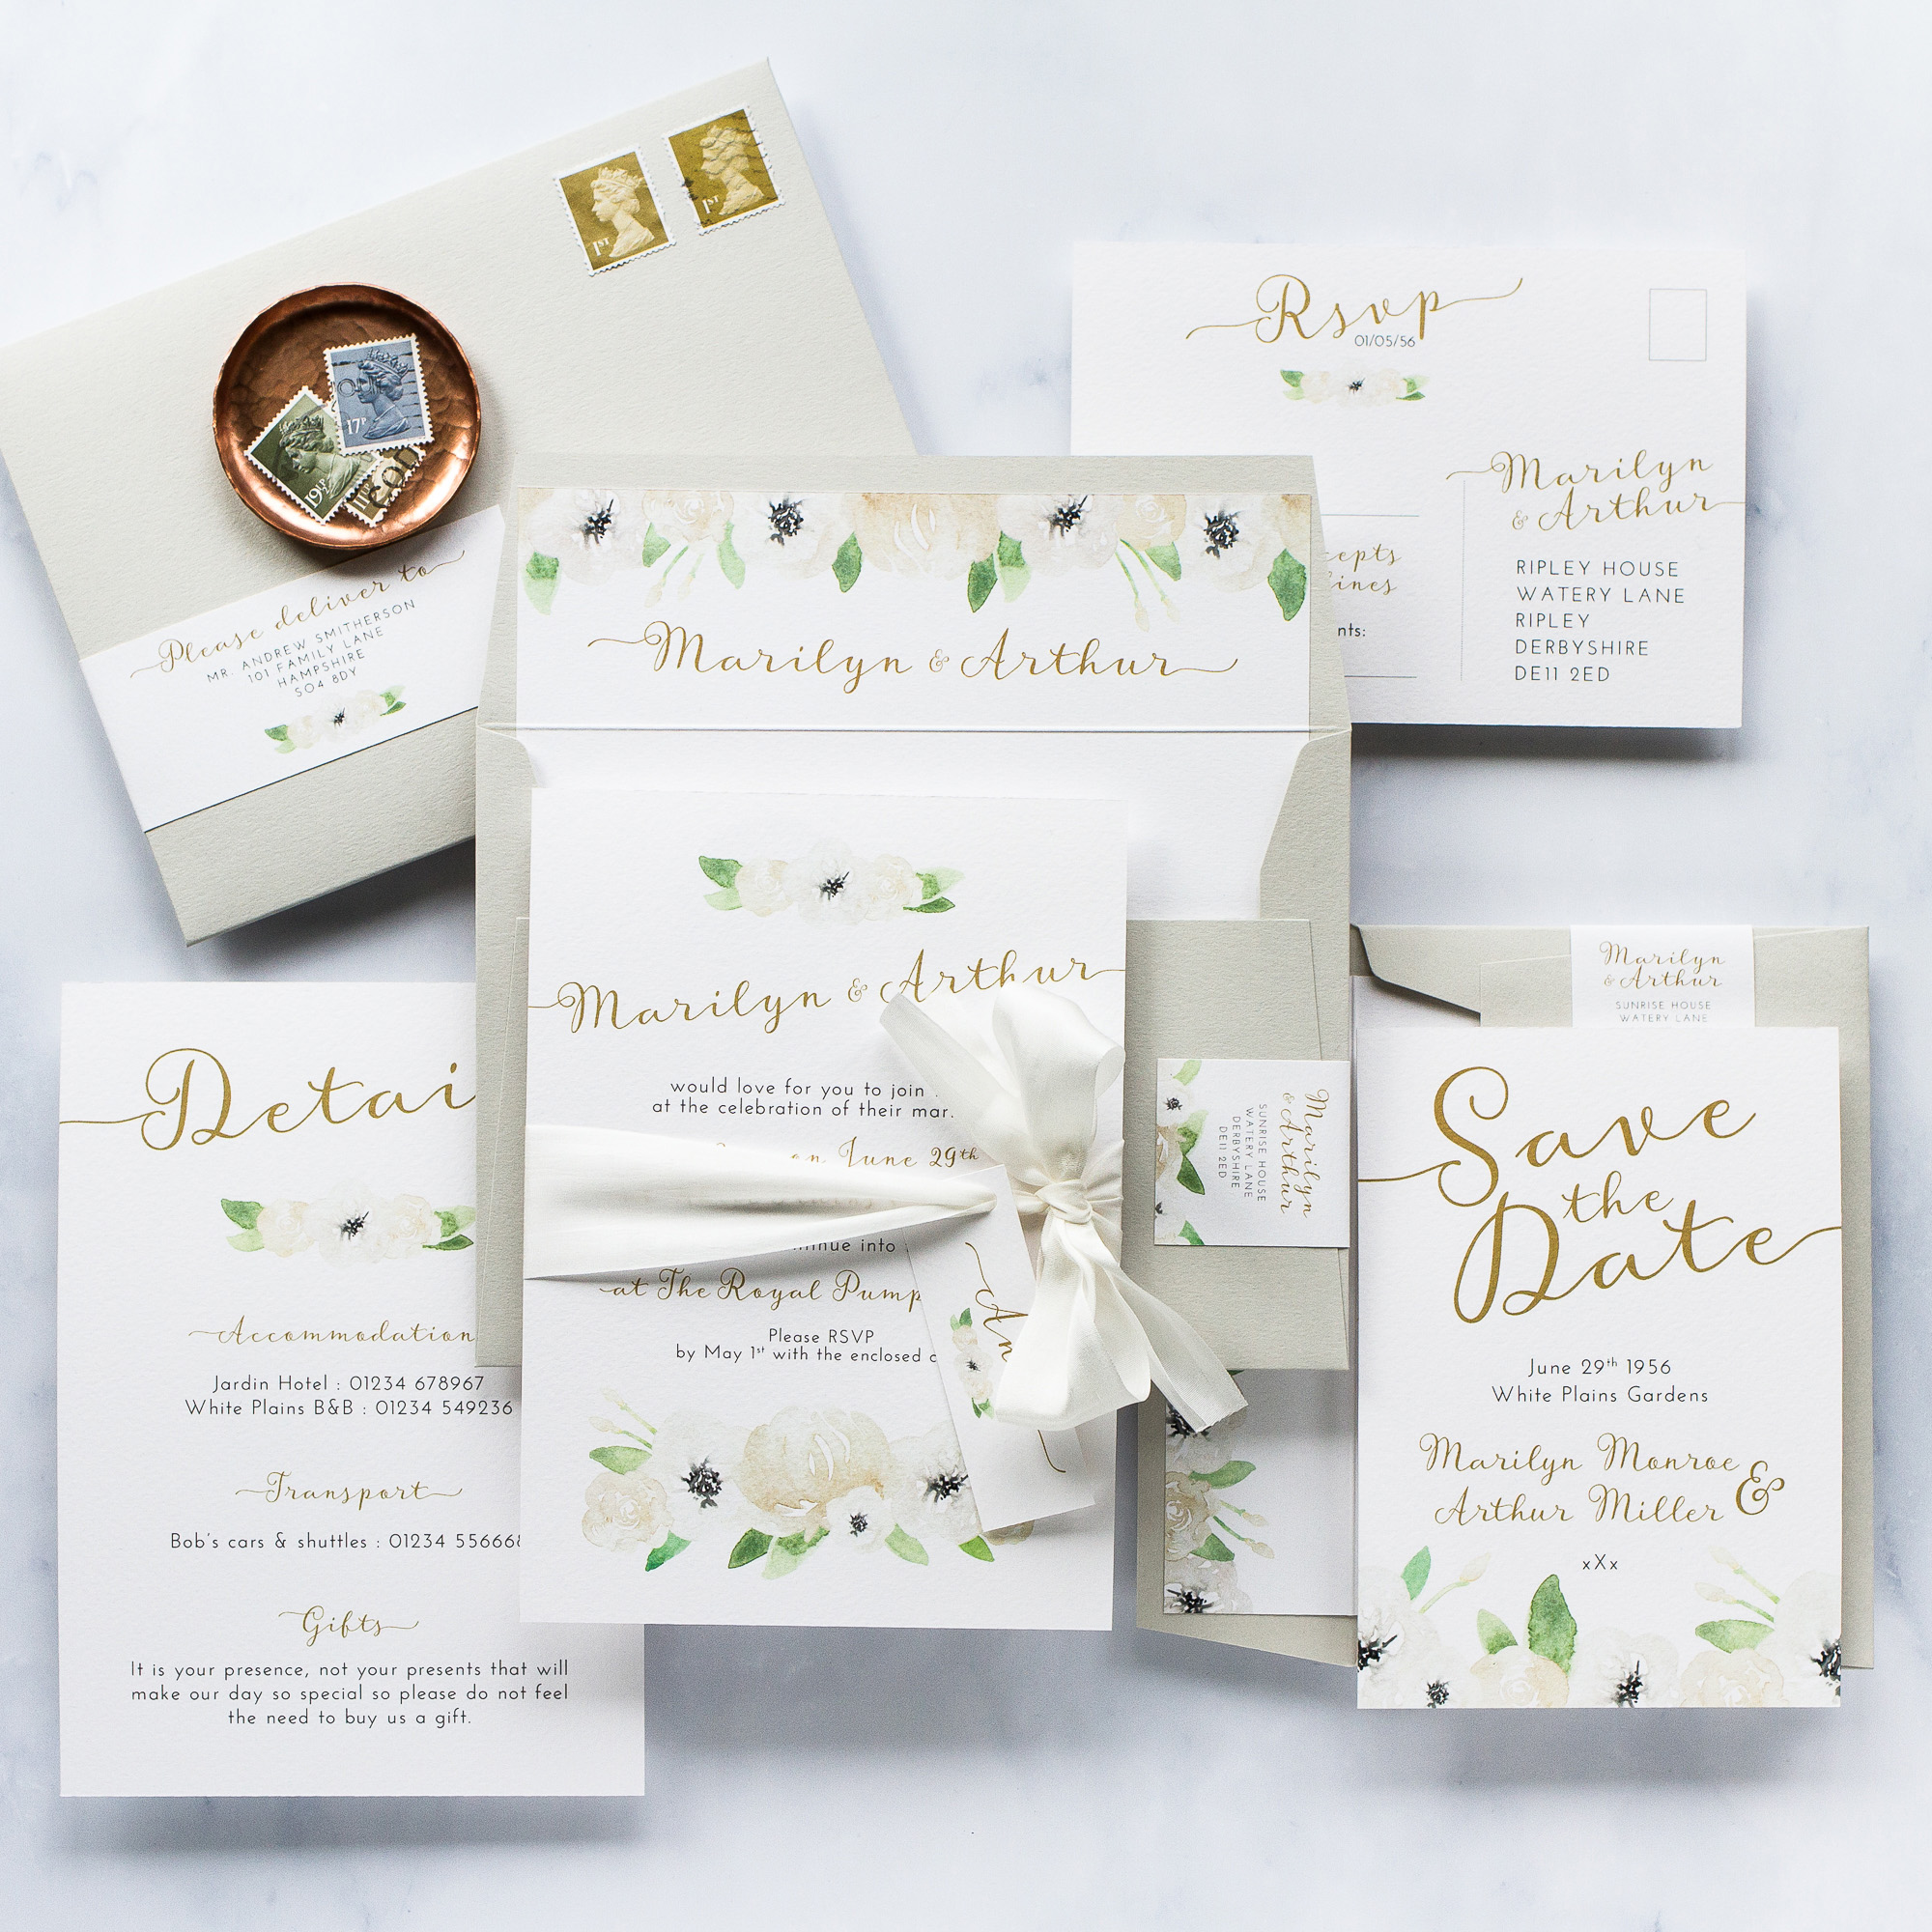 Luxurious-Wedding-Invitations-White-Rose-Ivory-Garden - Pingle Pie.jpg